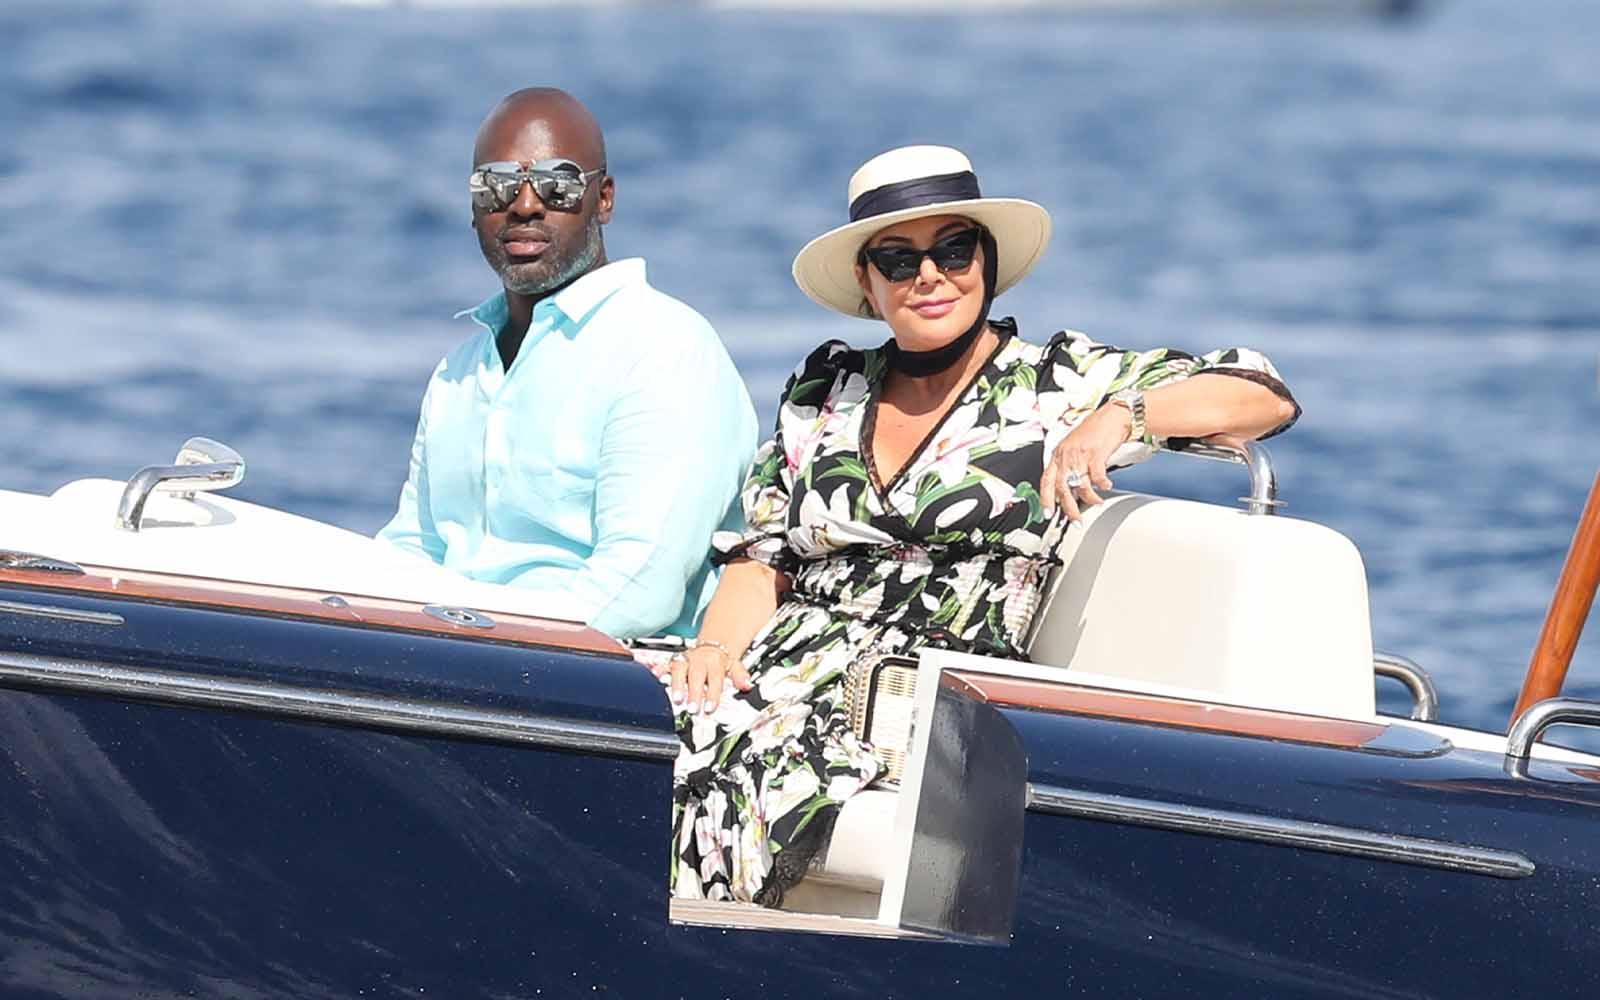 superiate kylie jenner - boat shopping